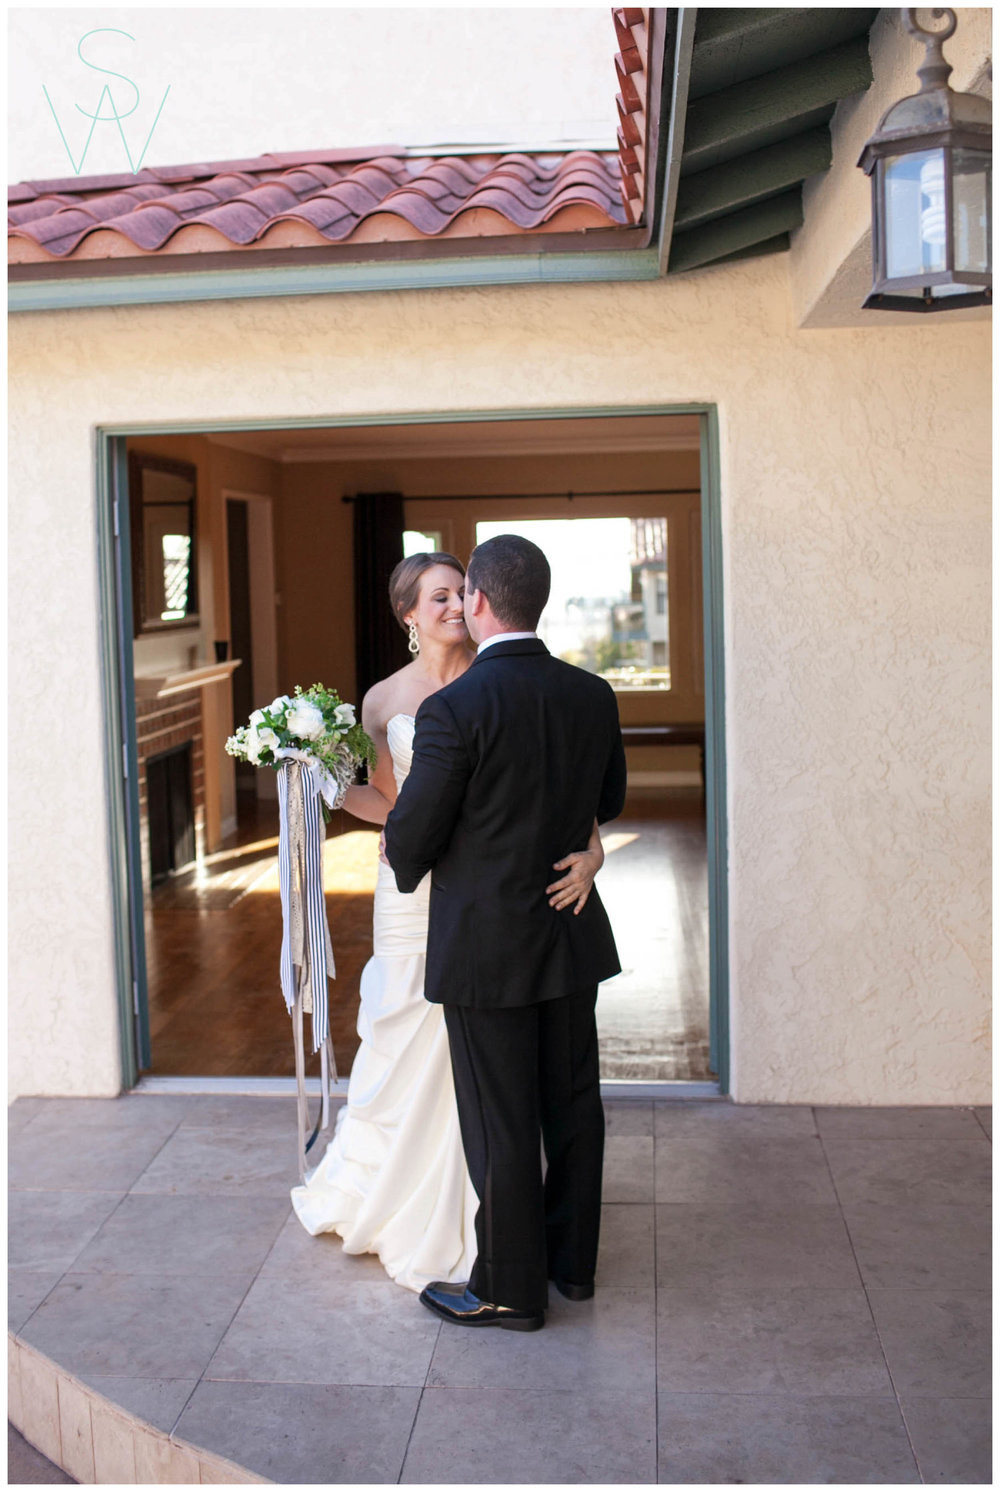 Shewanders.sdma_.wedding.photography-1019.jpg.wedding.photography-1019.jpg